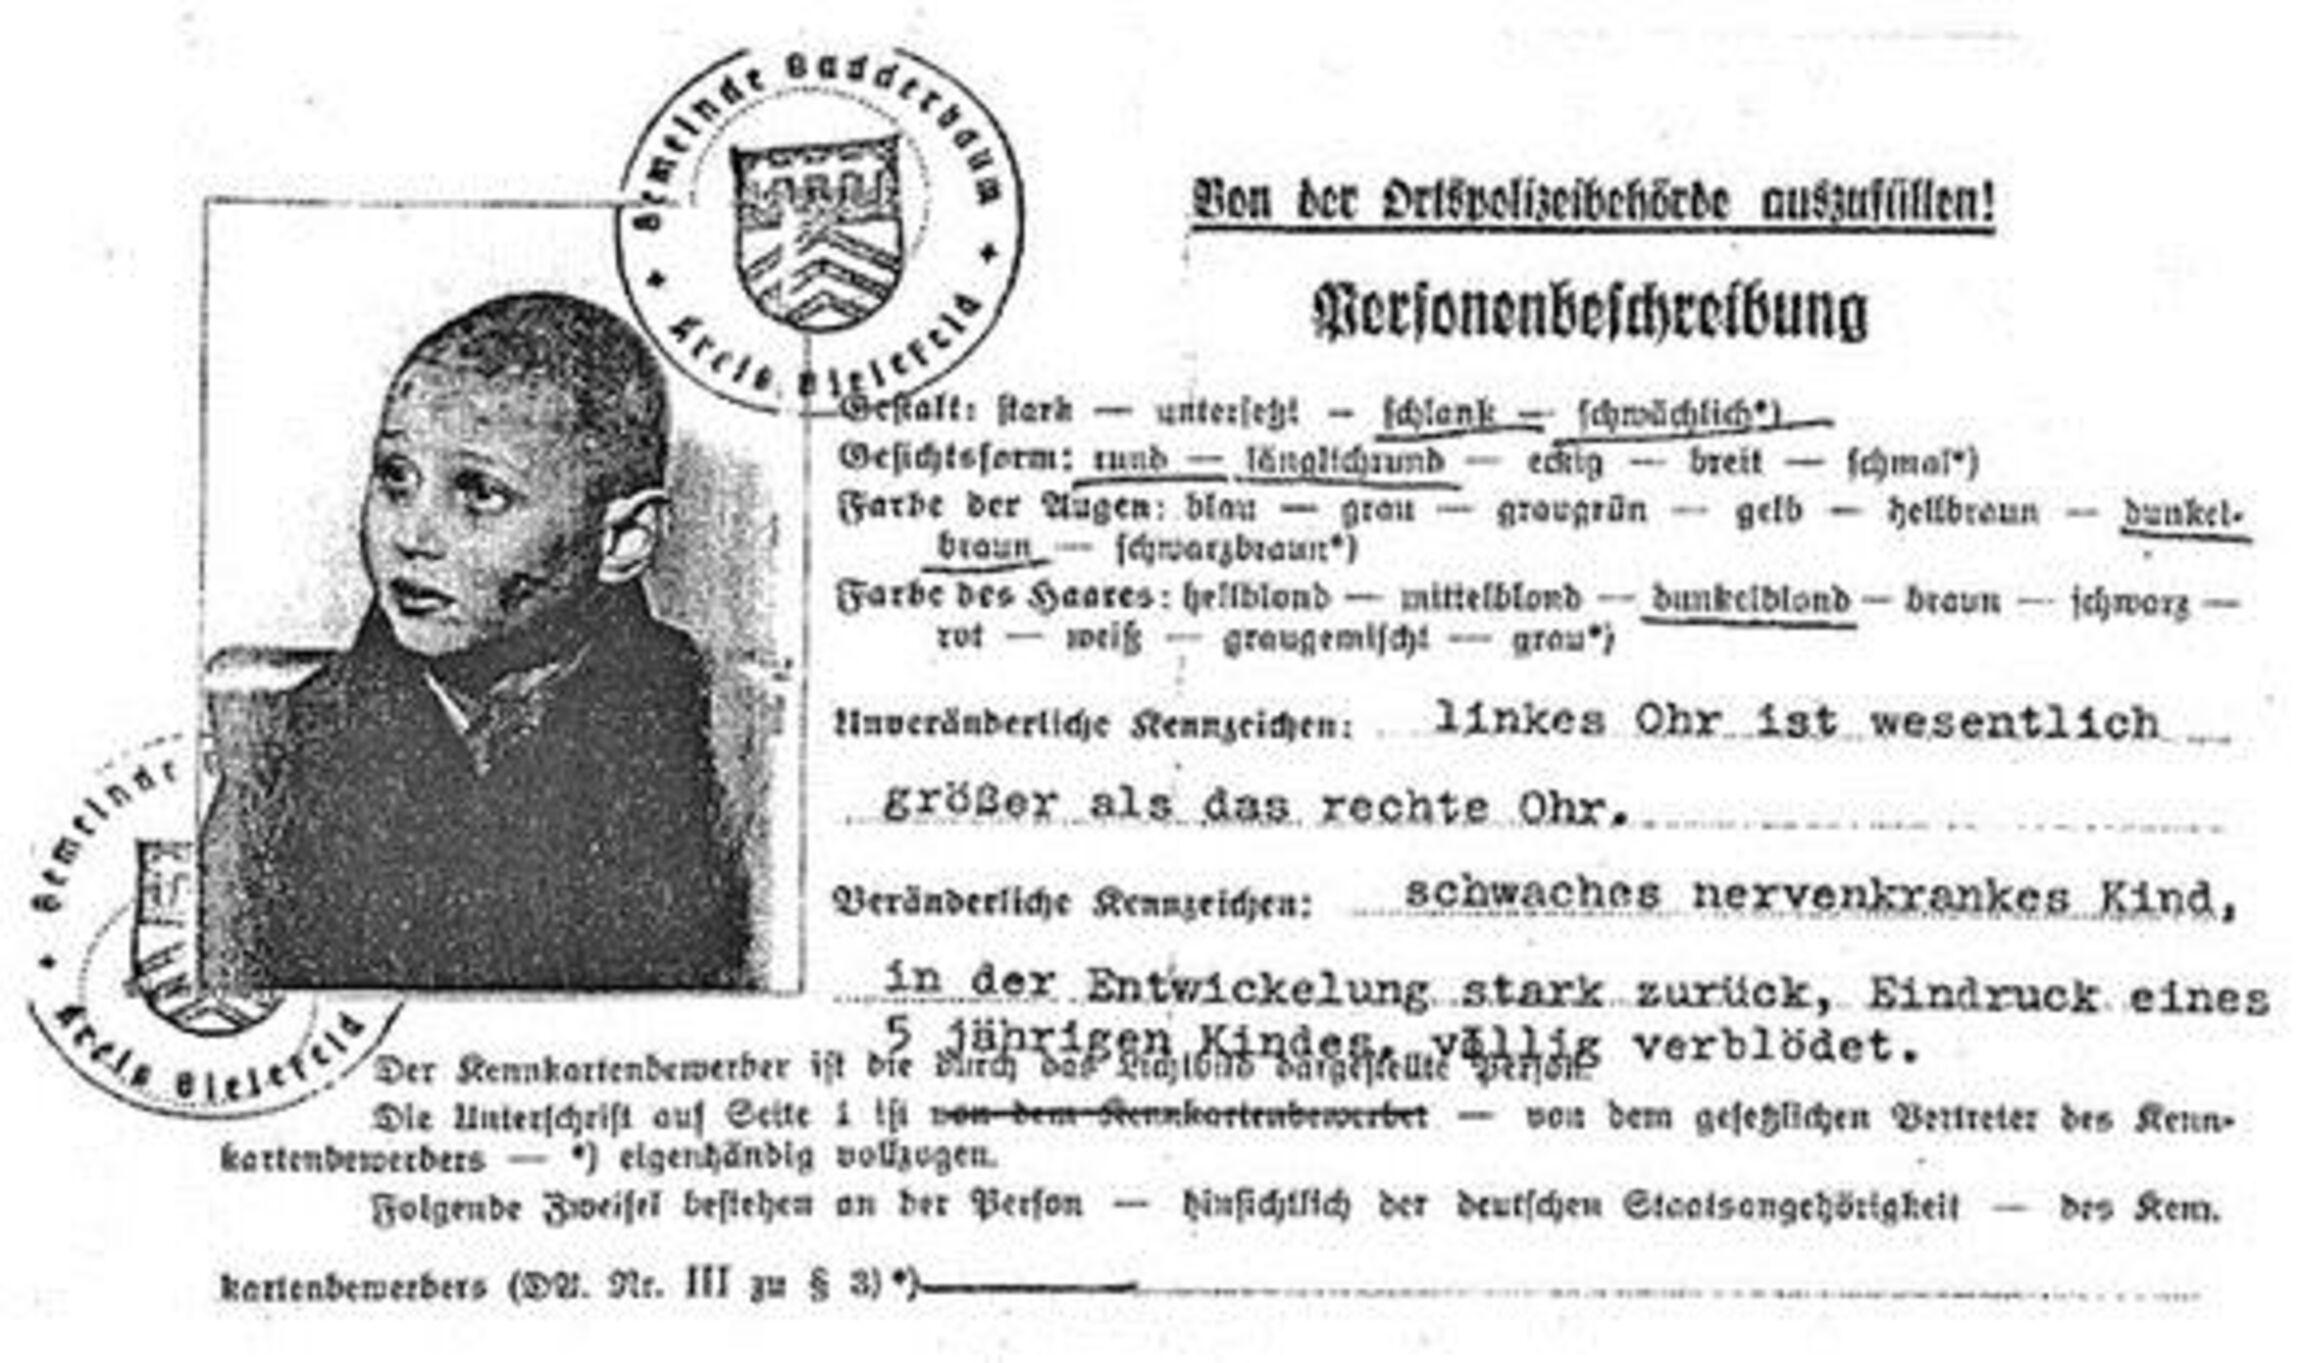 Personenbeschreibung Hermann Federmann